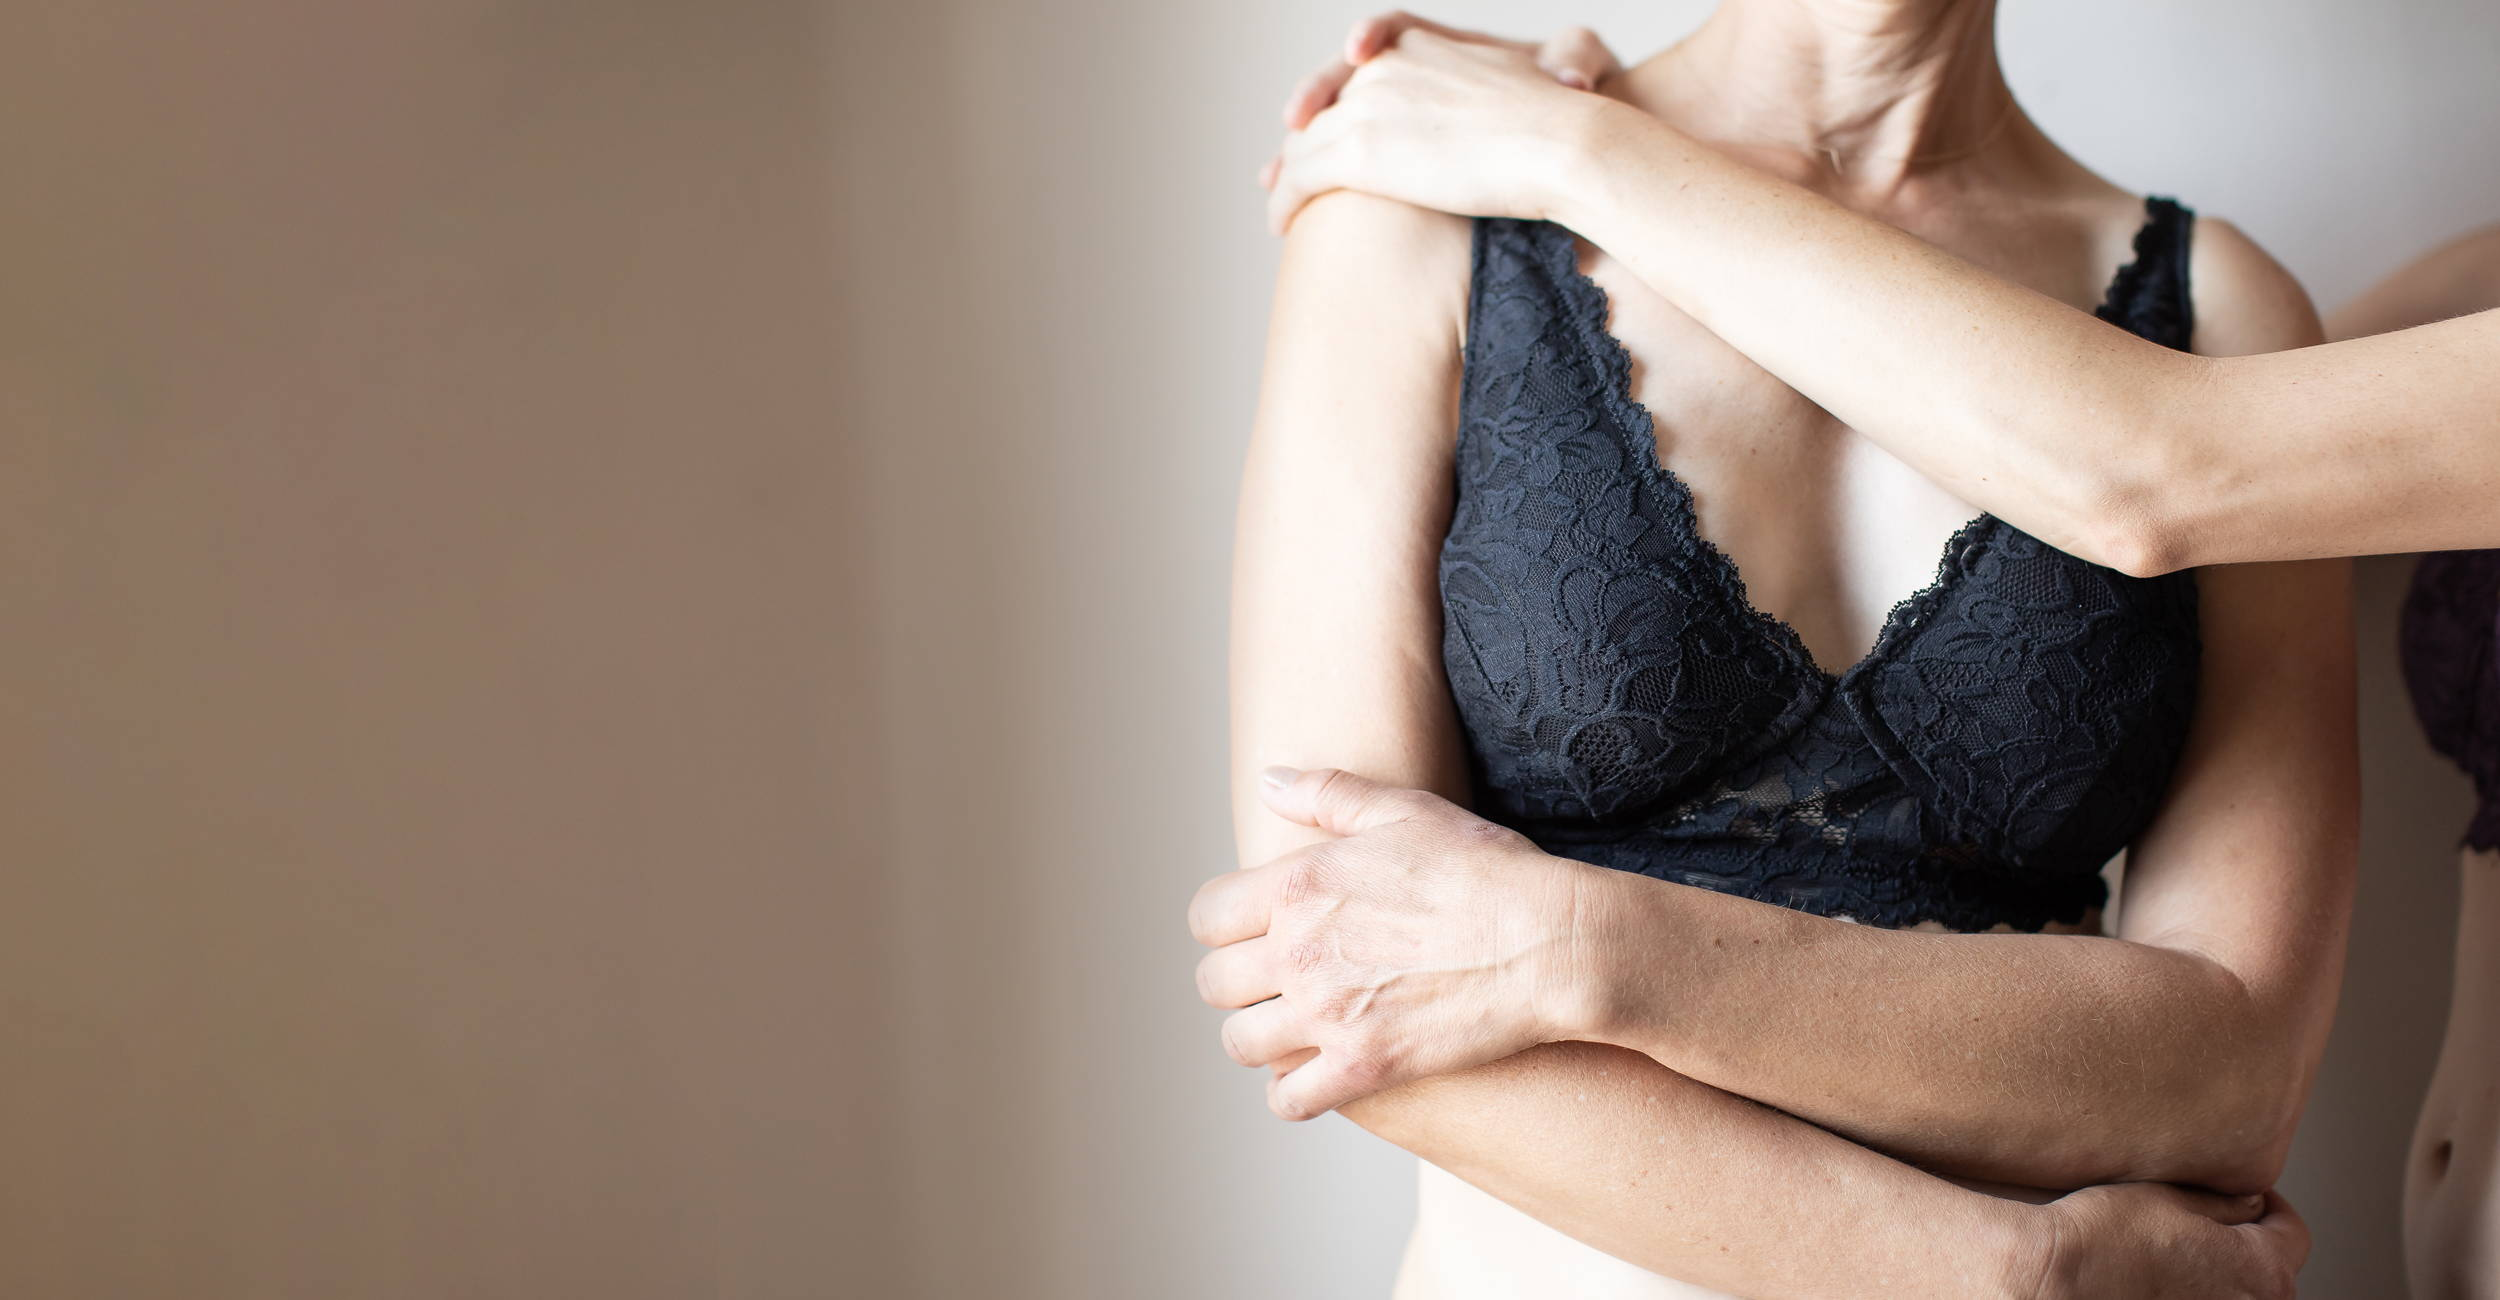 Woman wearing the Mastectomy Everviolet Vela Pocketed Bra